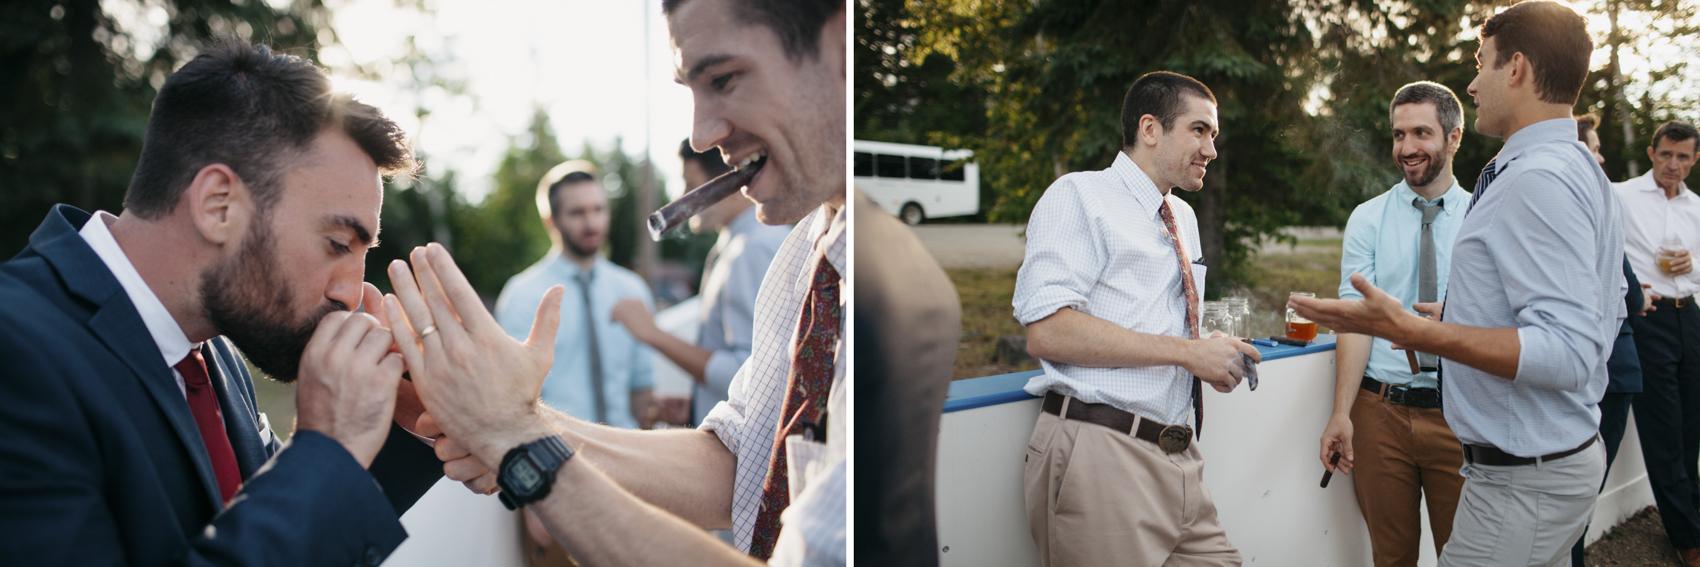 LFA_JuliaGlenn_Sugarloaf_Maine_Wedding019.jpg